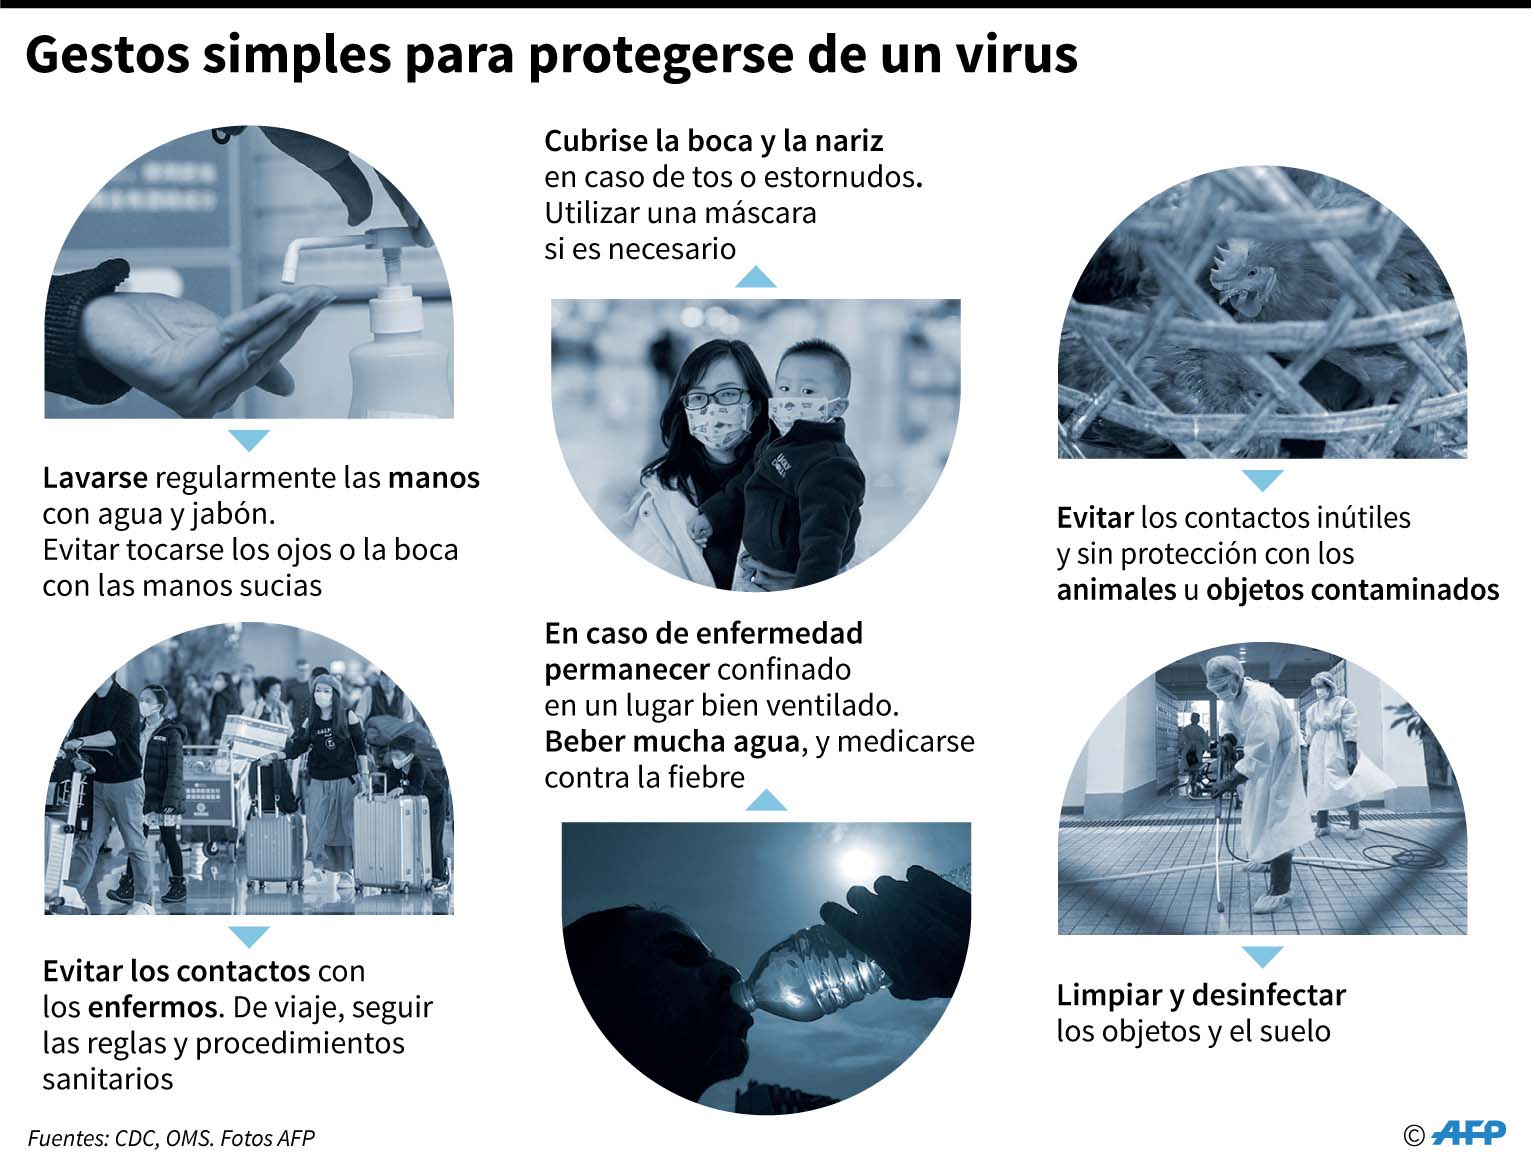 coronavirus. epidemia, conavid-19, japón